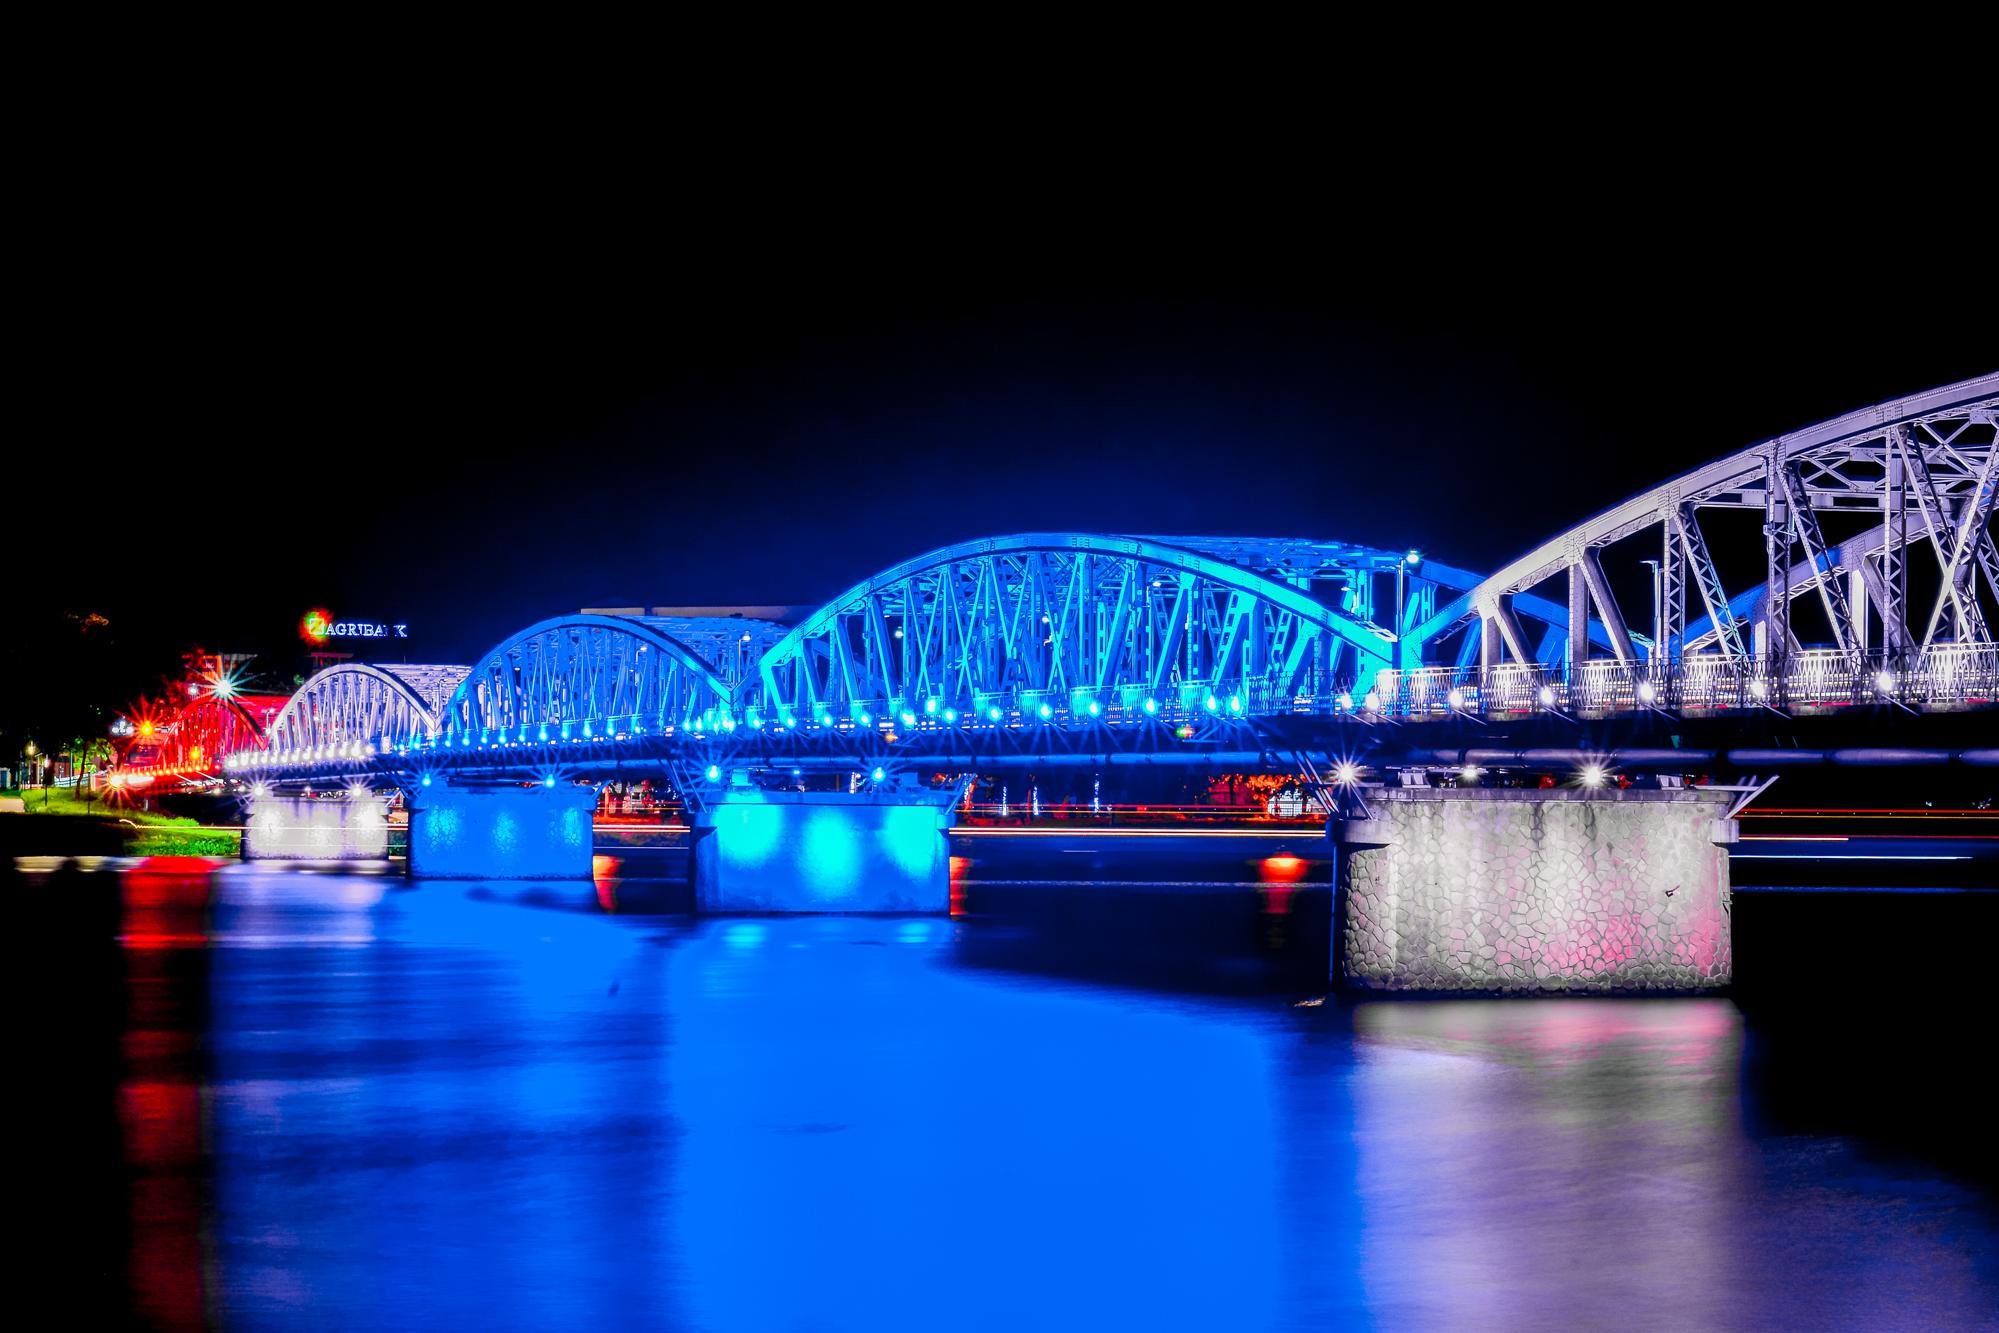 Truong Tien Bridge at Night